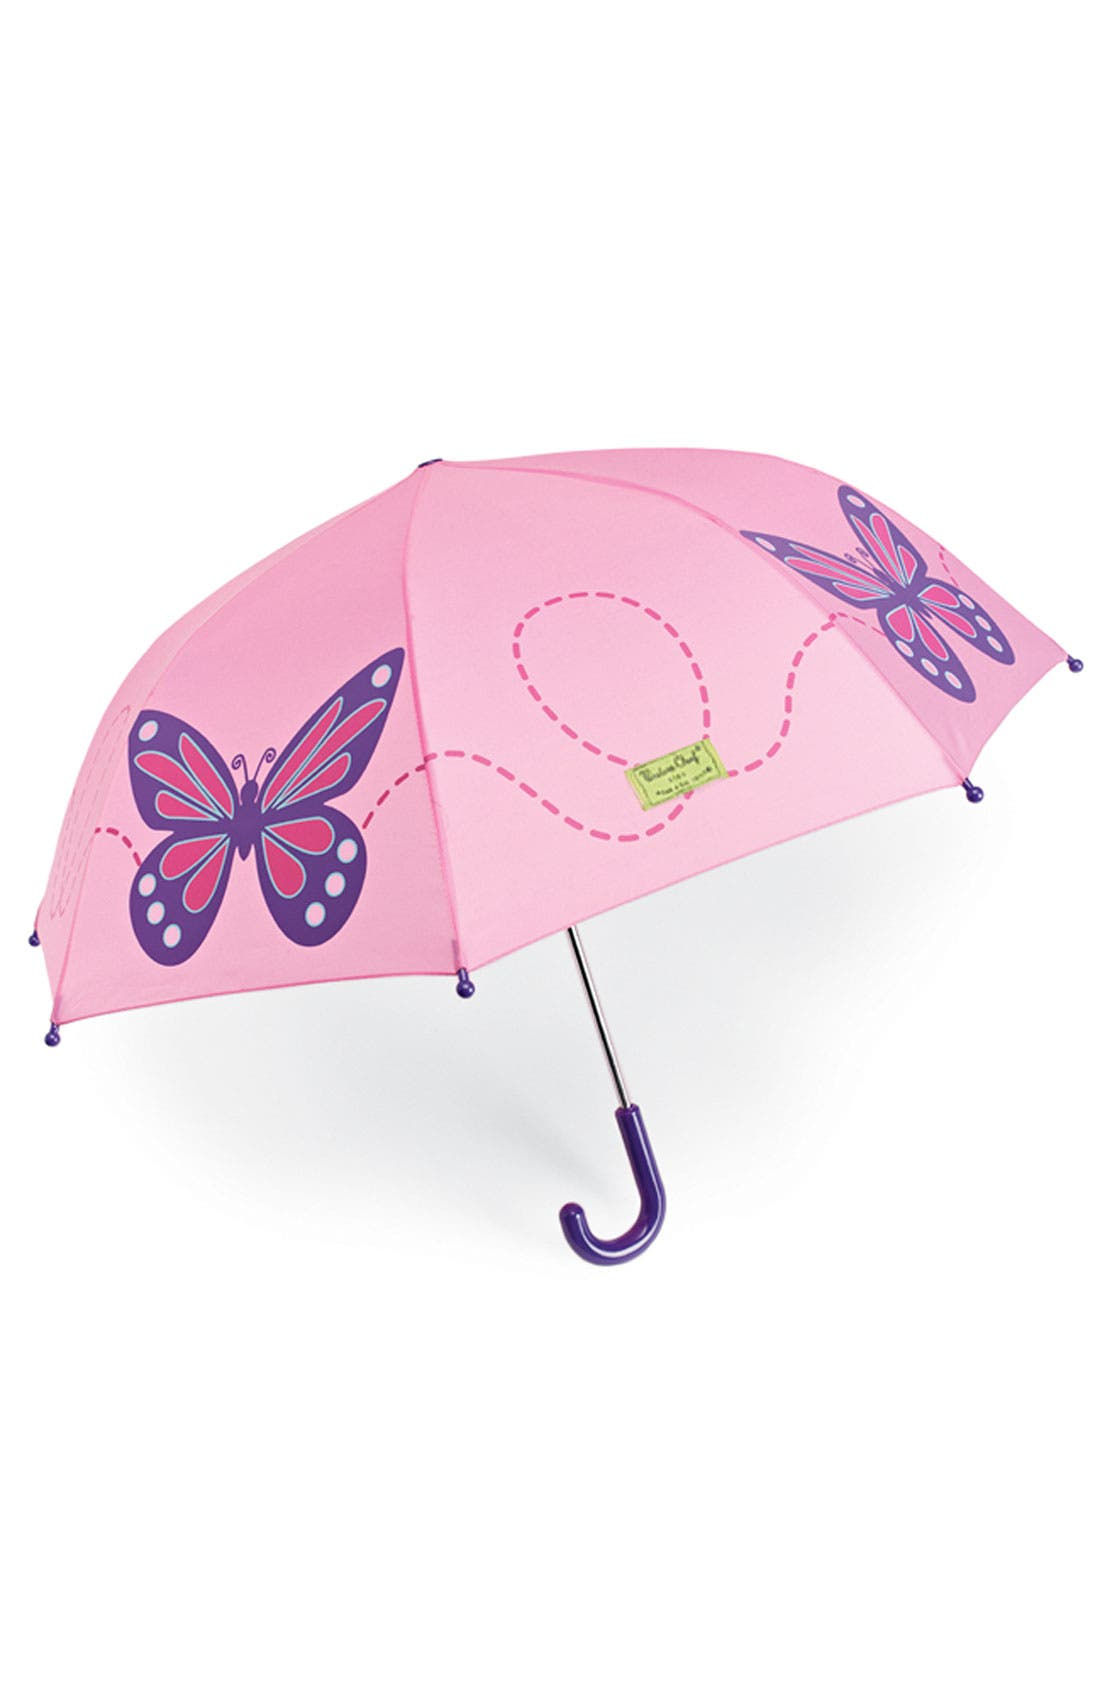 Main Image - Western Chief 'Wings' Umbrella